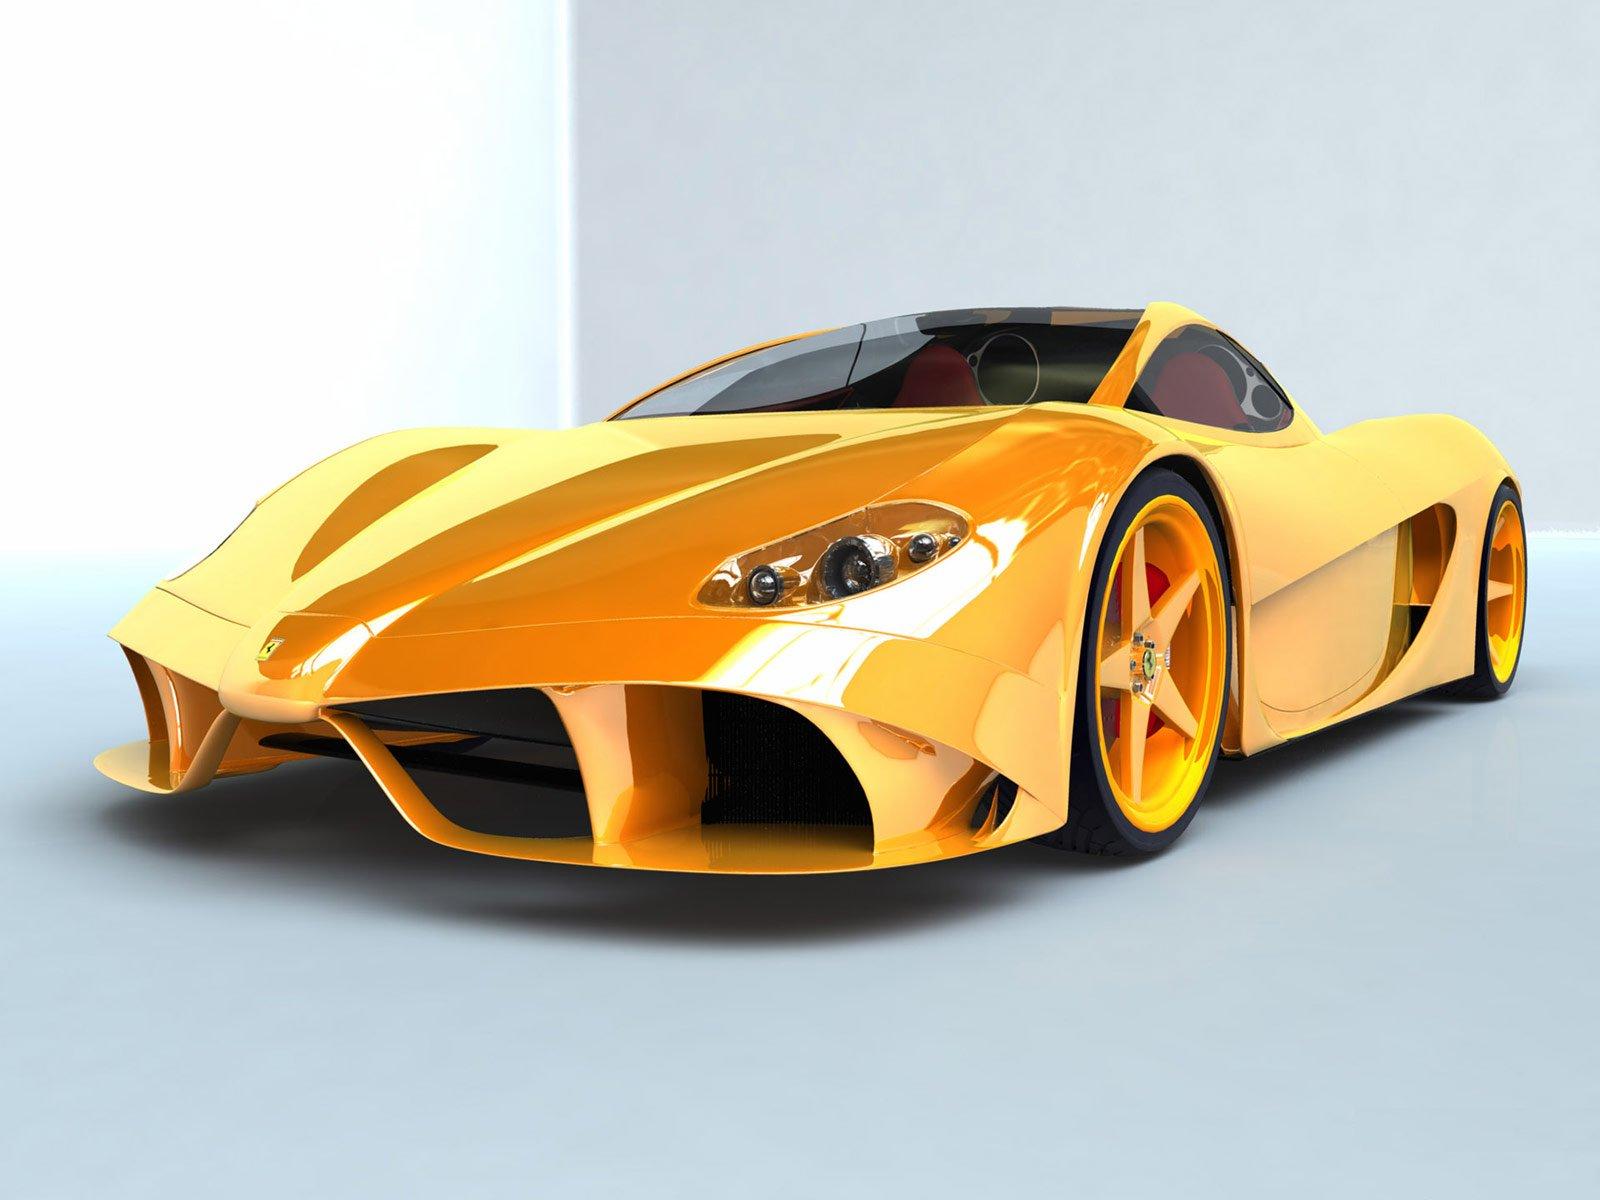 http://3.bp.blogspot.com/-Lg9SwejMdec/ThApTZ9Y3OI/AAAAAAAAFe8/w-ZddR6GuUA/s1600/cars%2Bwallpapers-2.jpg